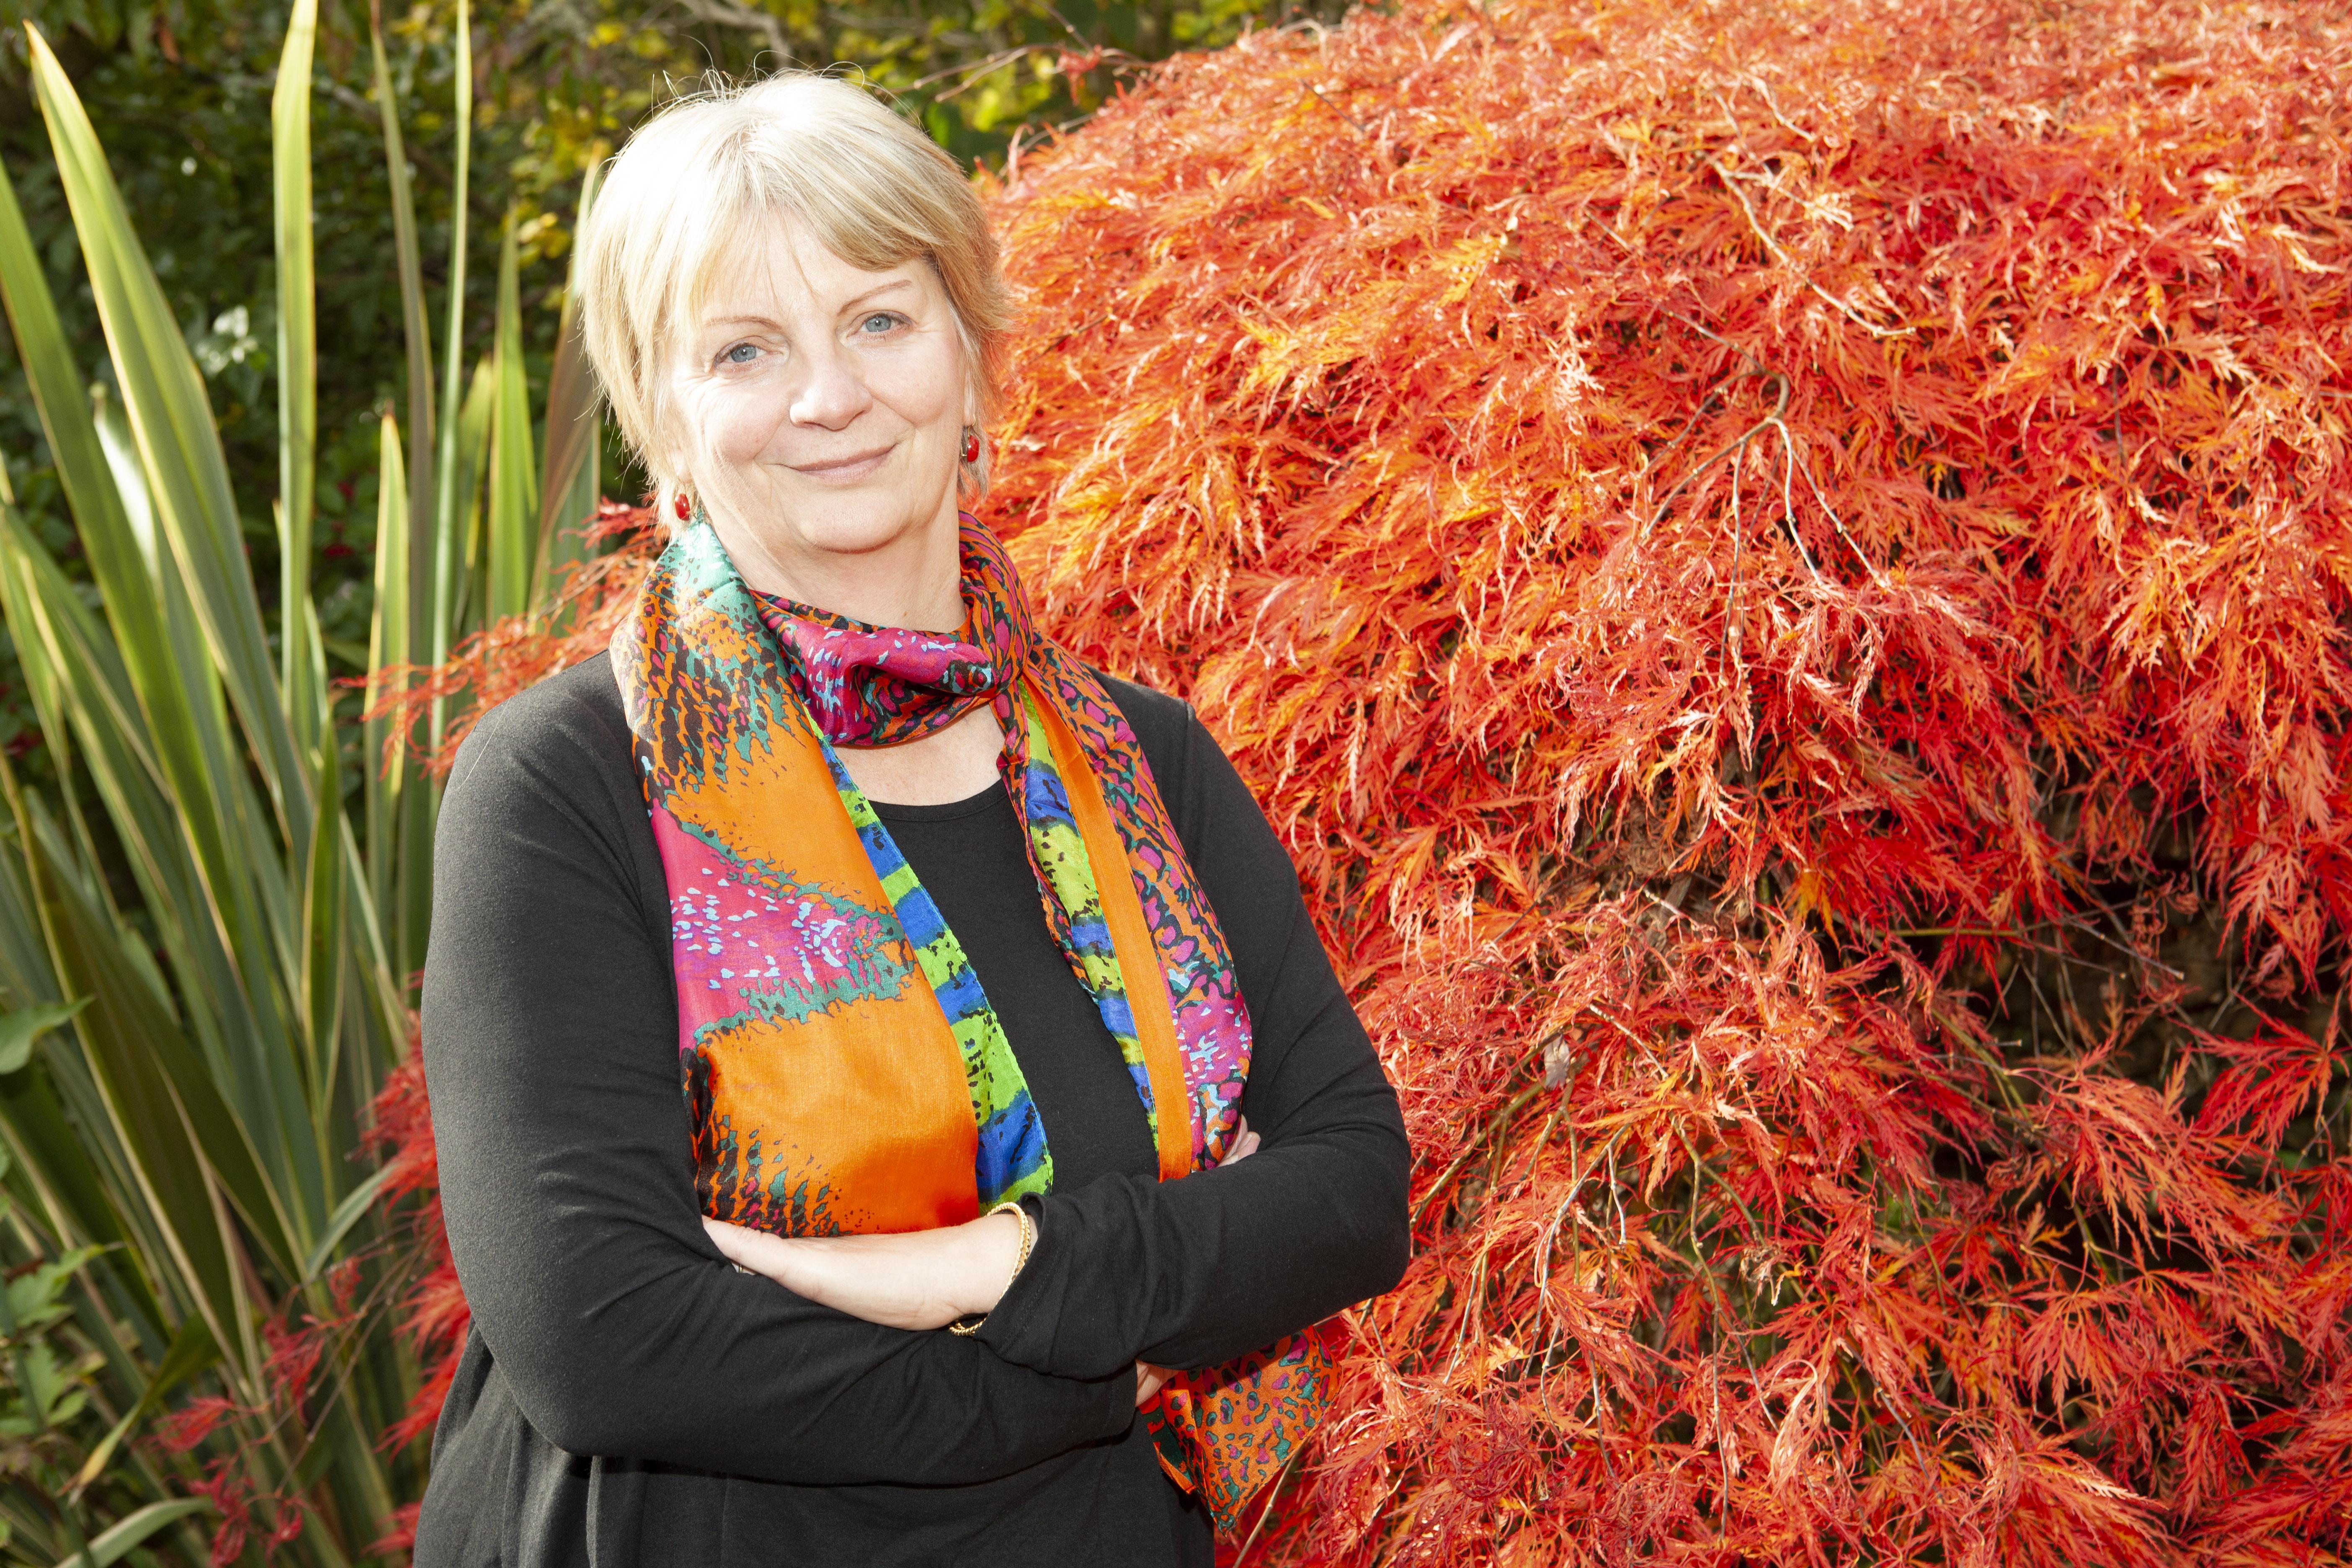 Claire Cooper, Head of the Cateran Ecomuseum